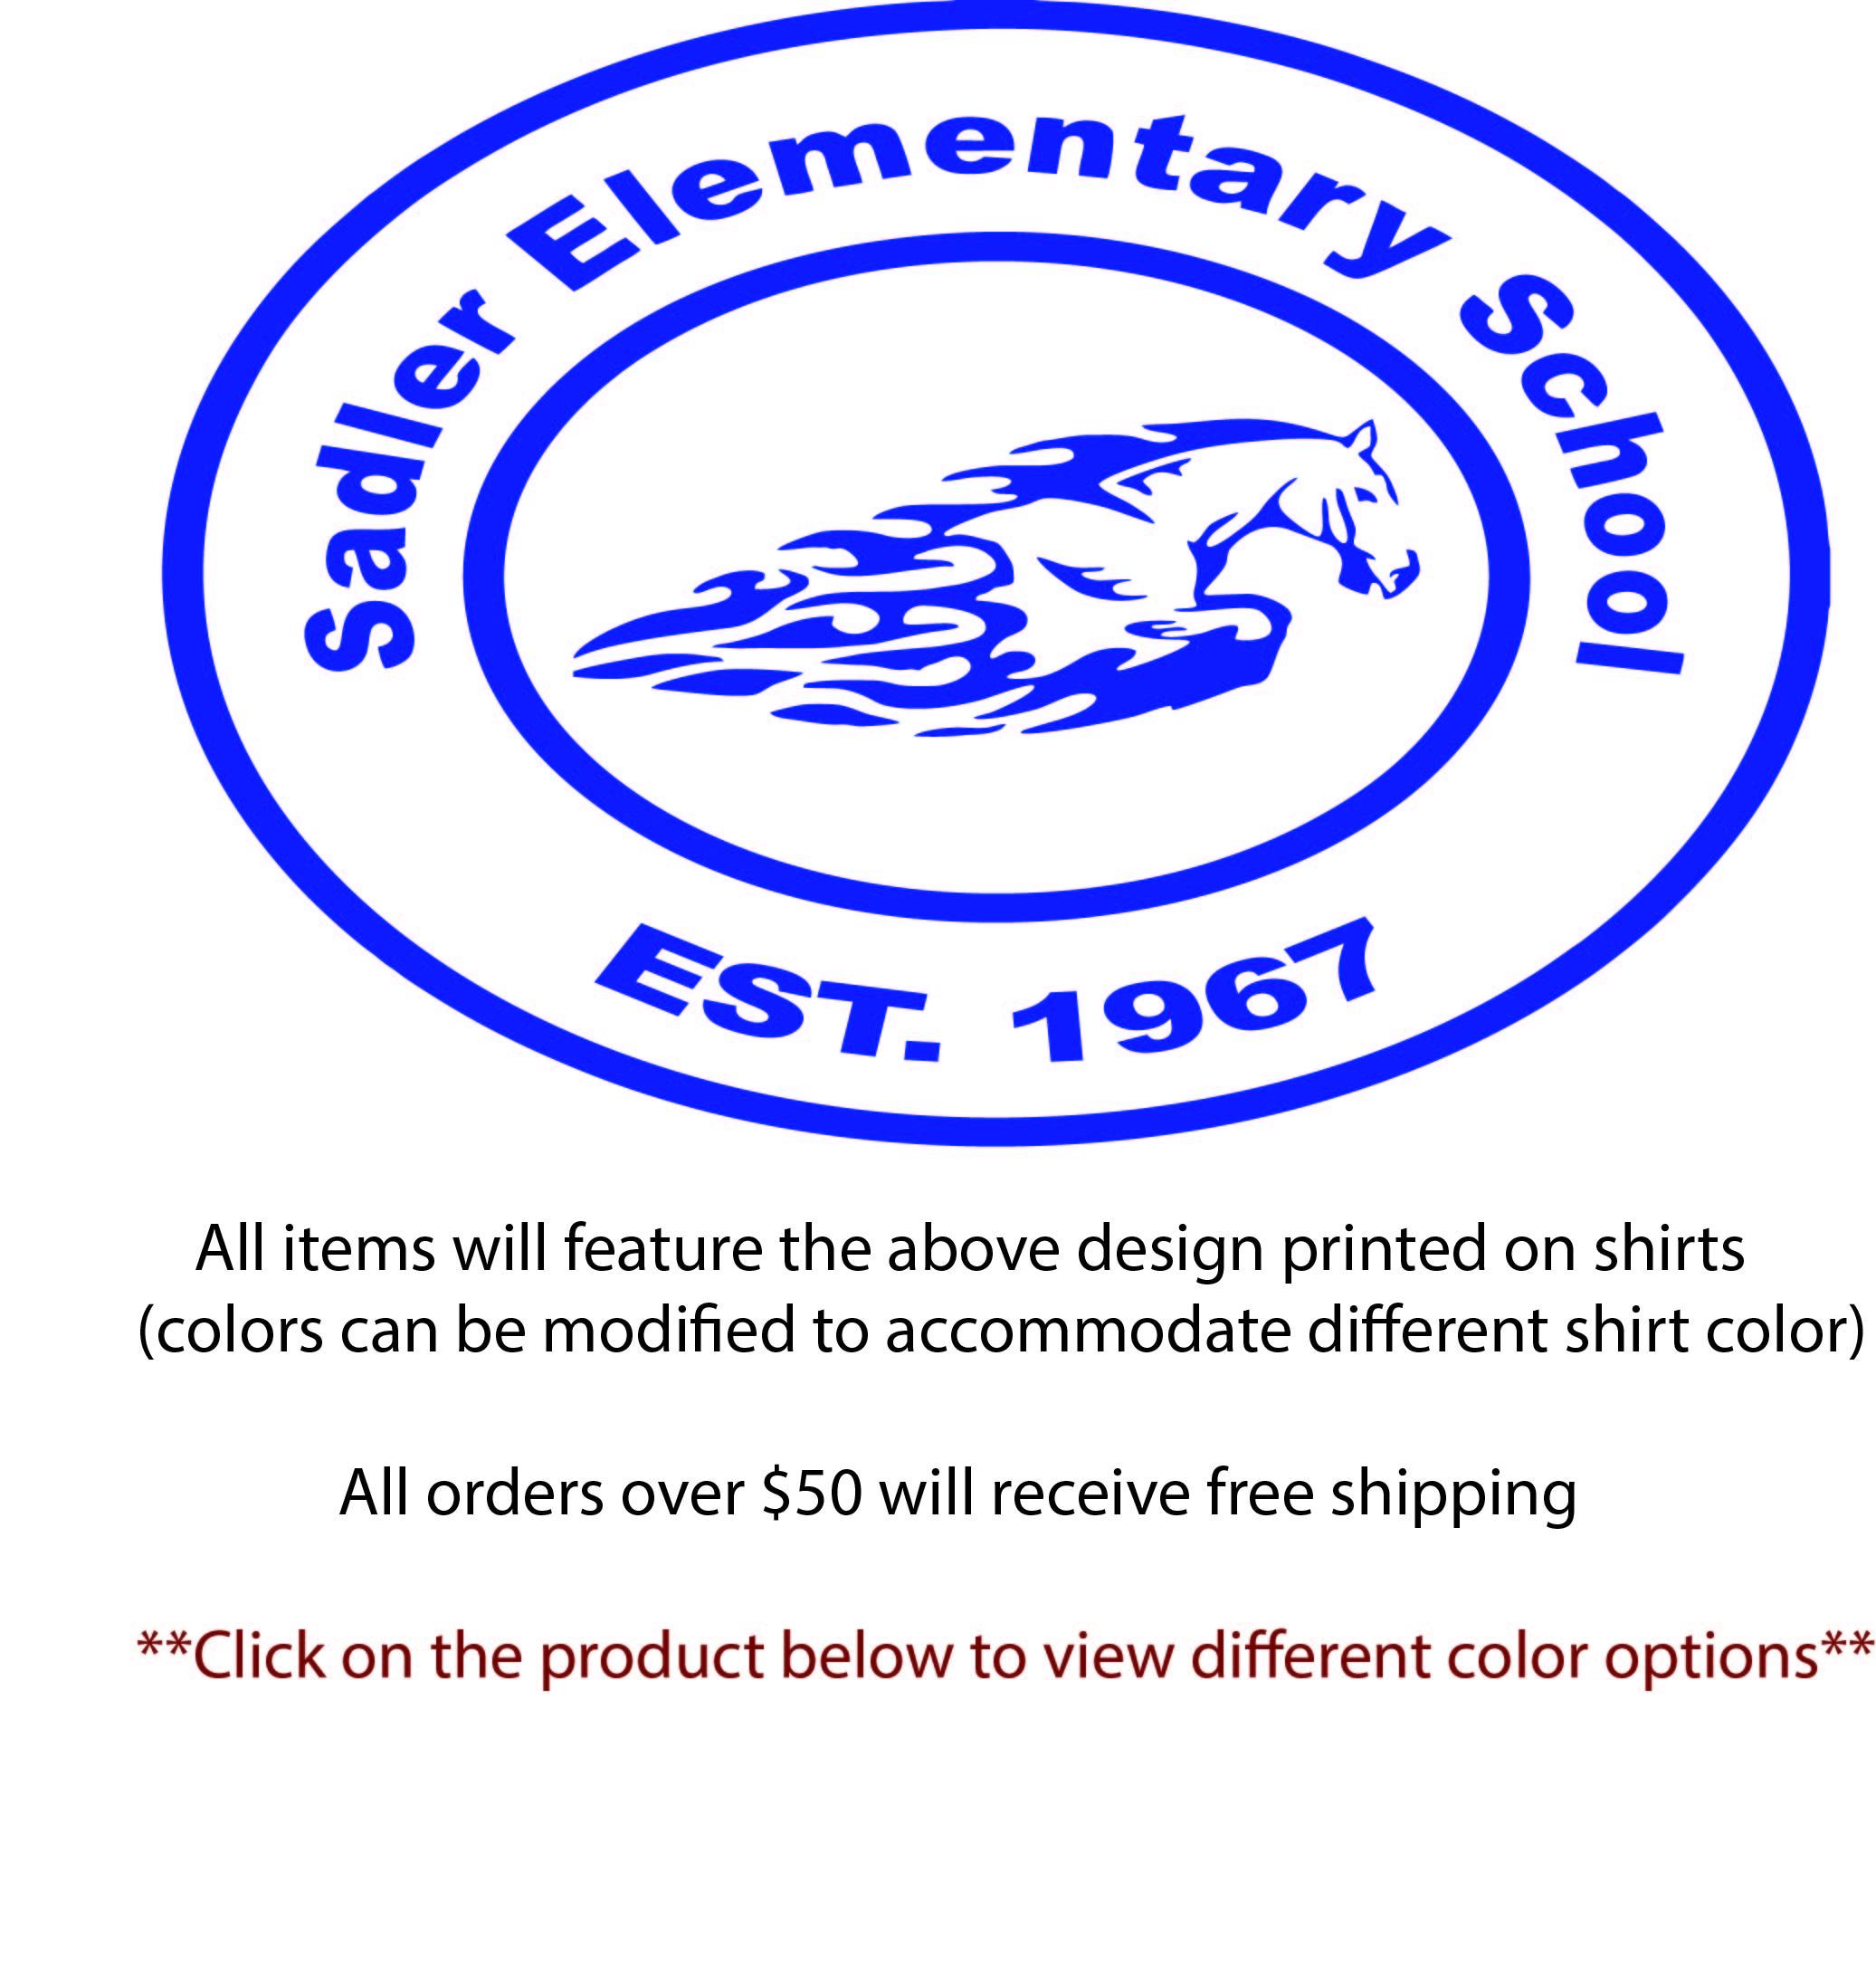 sadler-web-site-header-uniforms.jpg